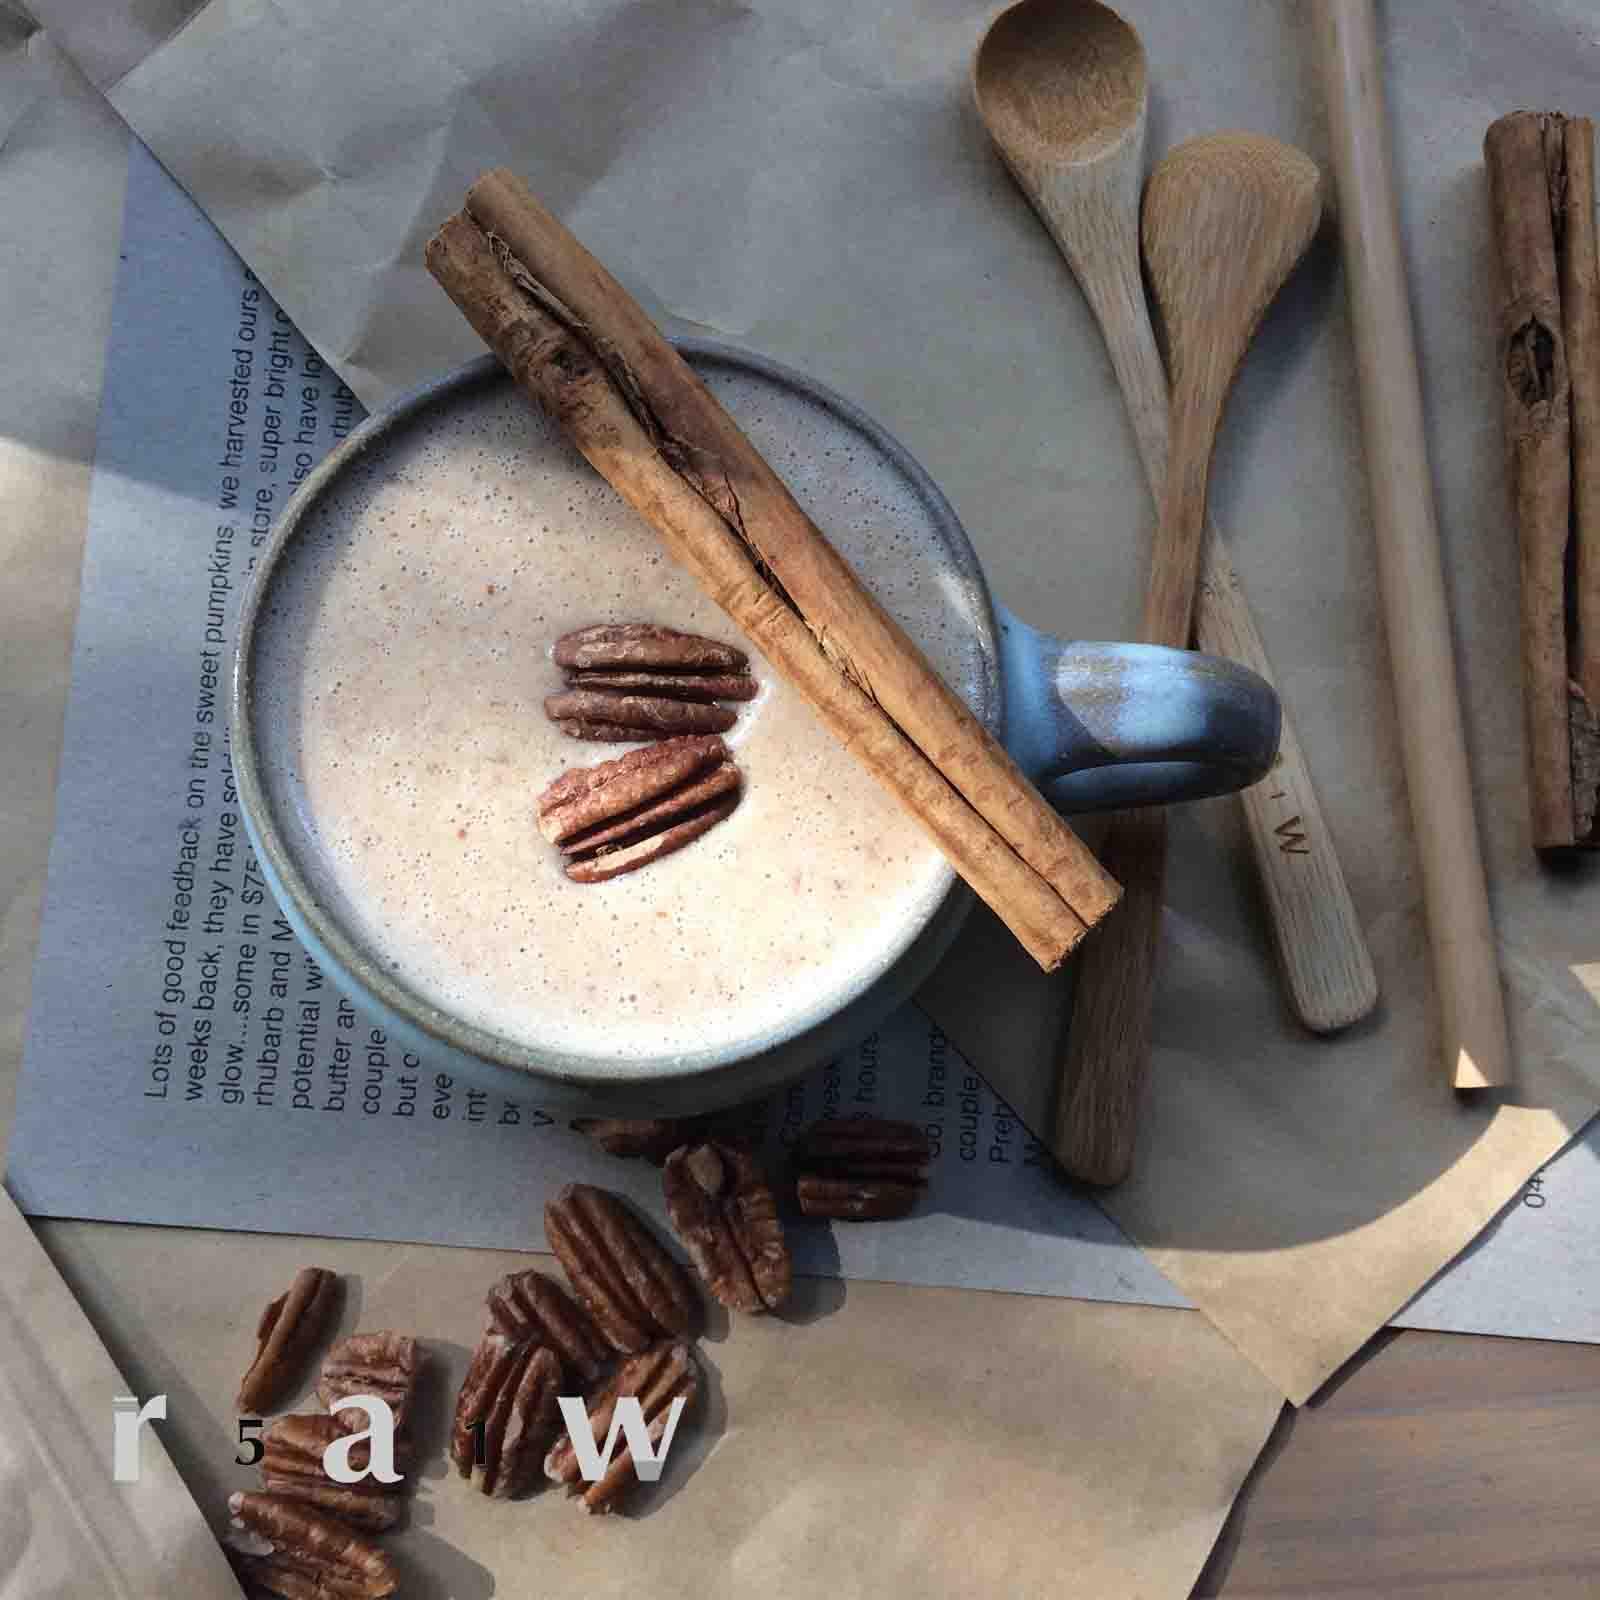 51raw-cinnamon-pecan-creamy-delight-smoothie-.jpg